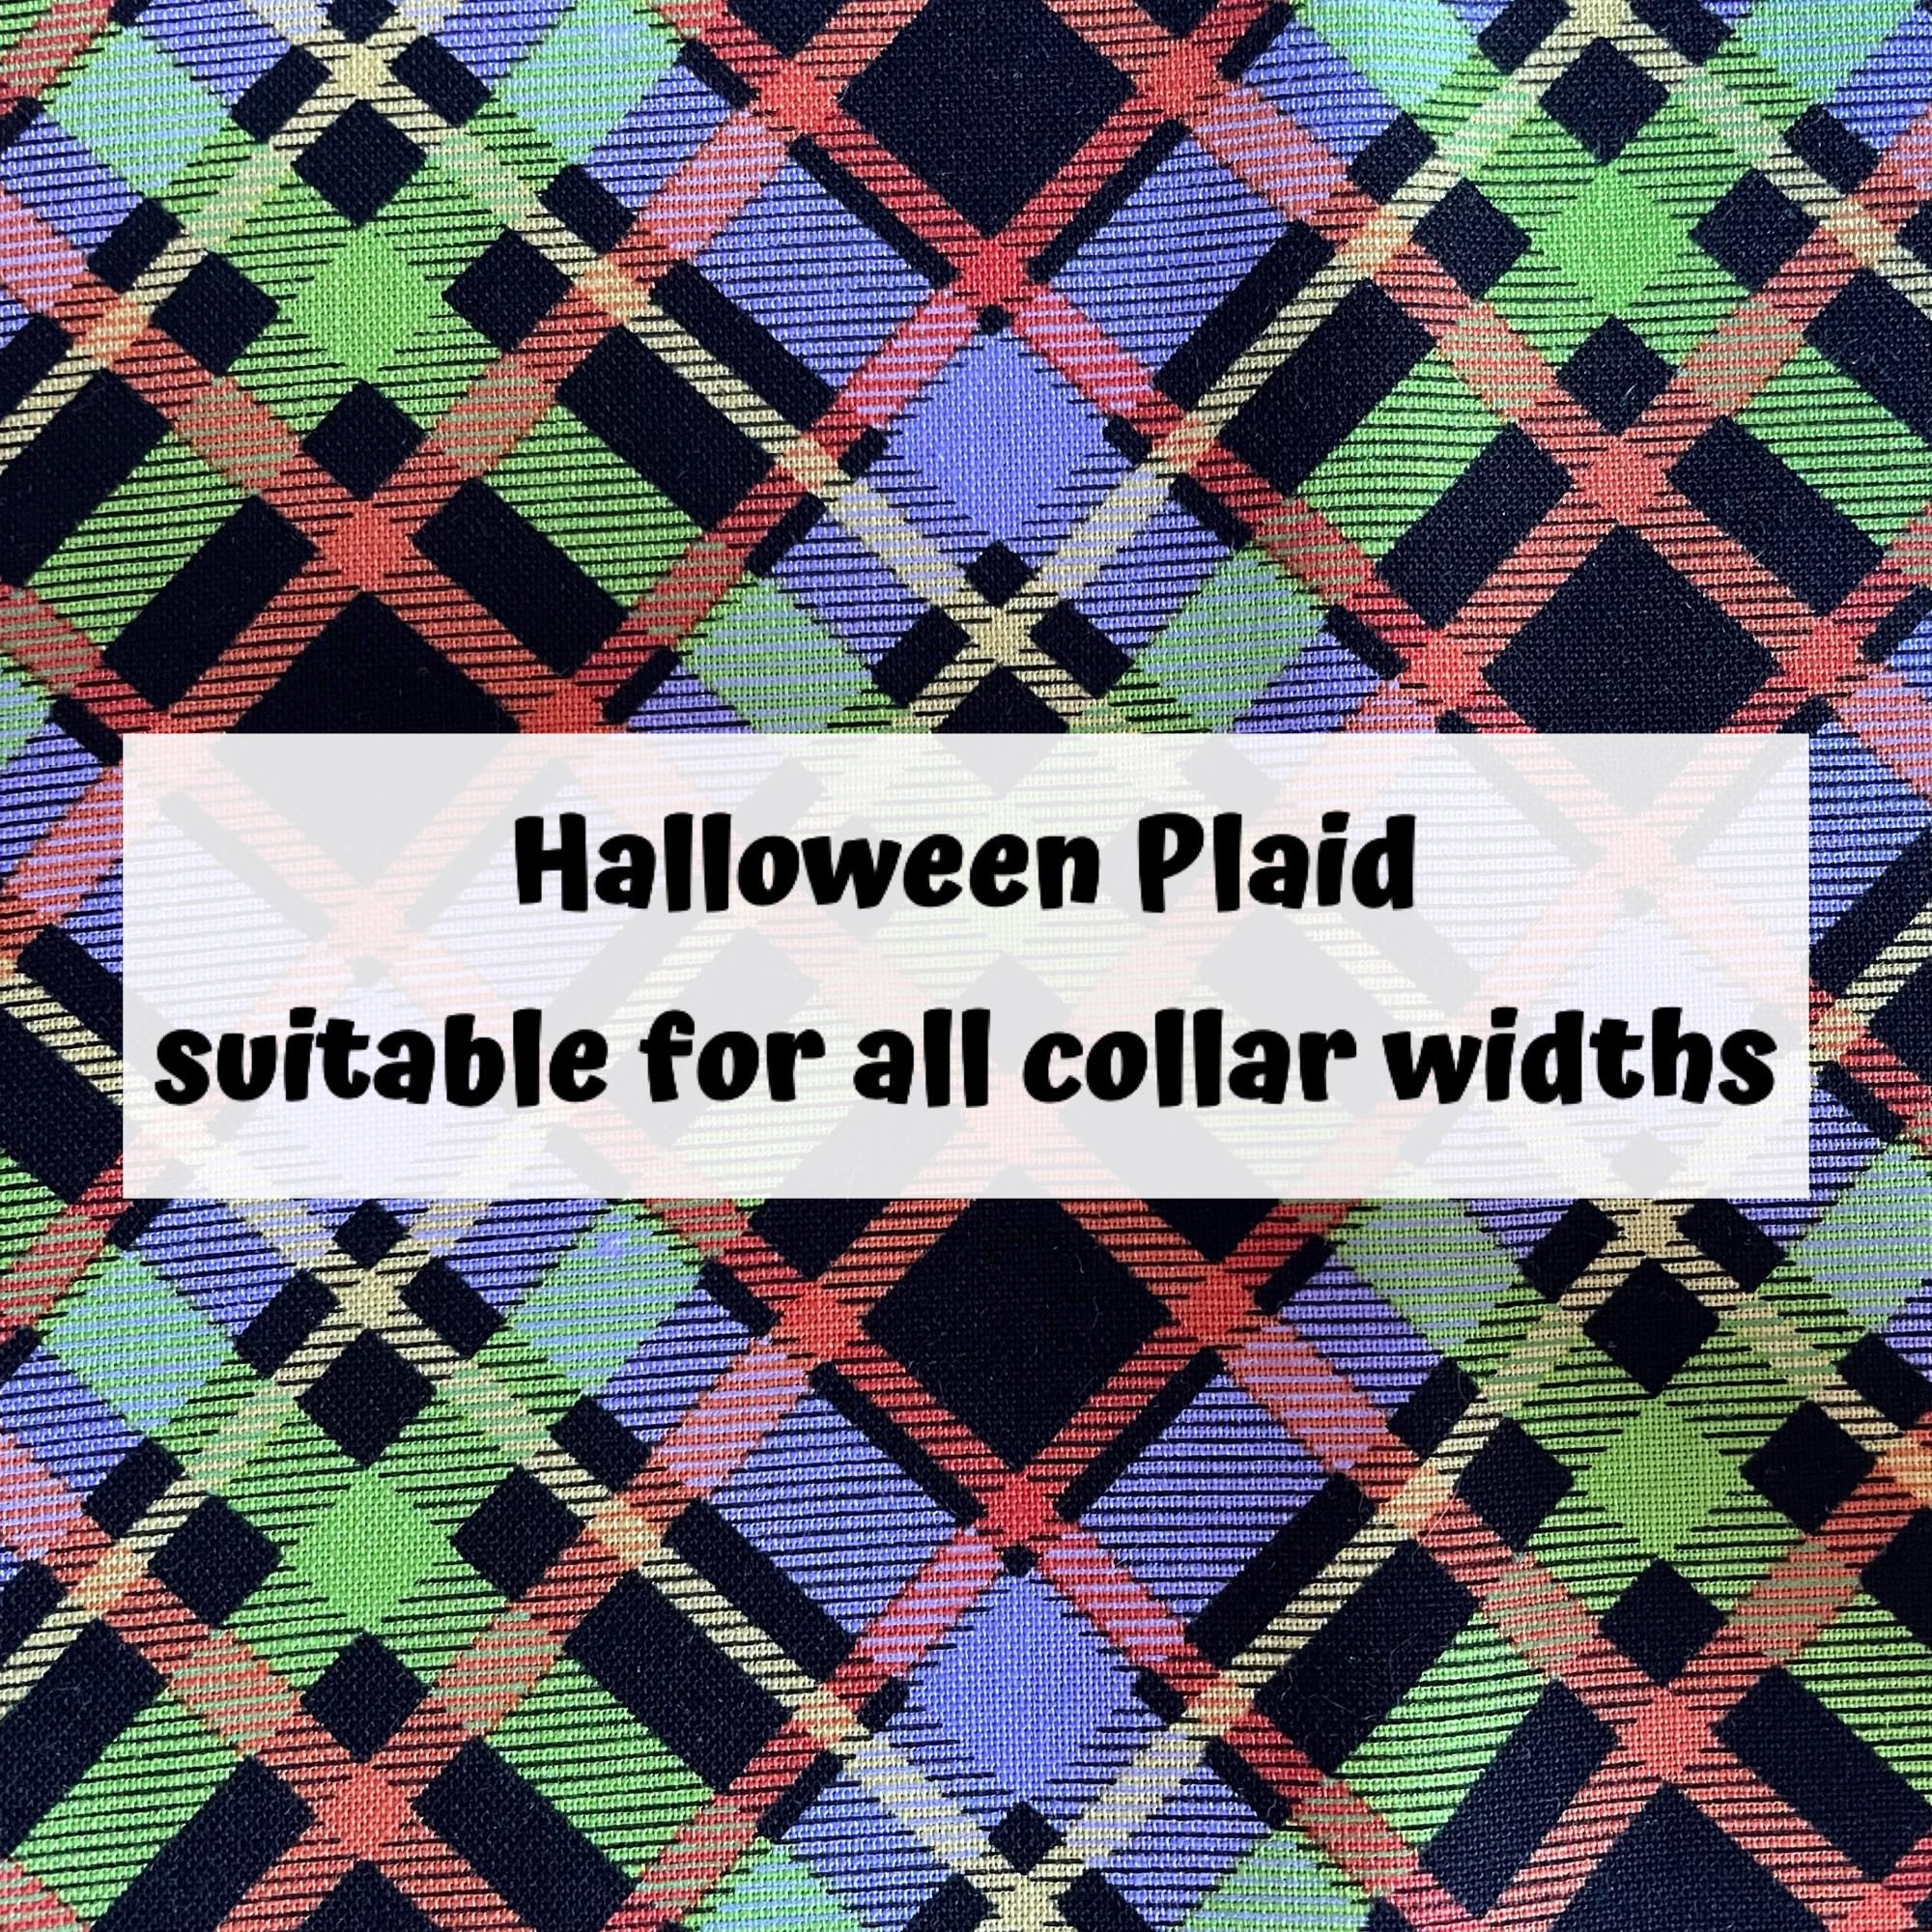 Halloween Plaid